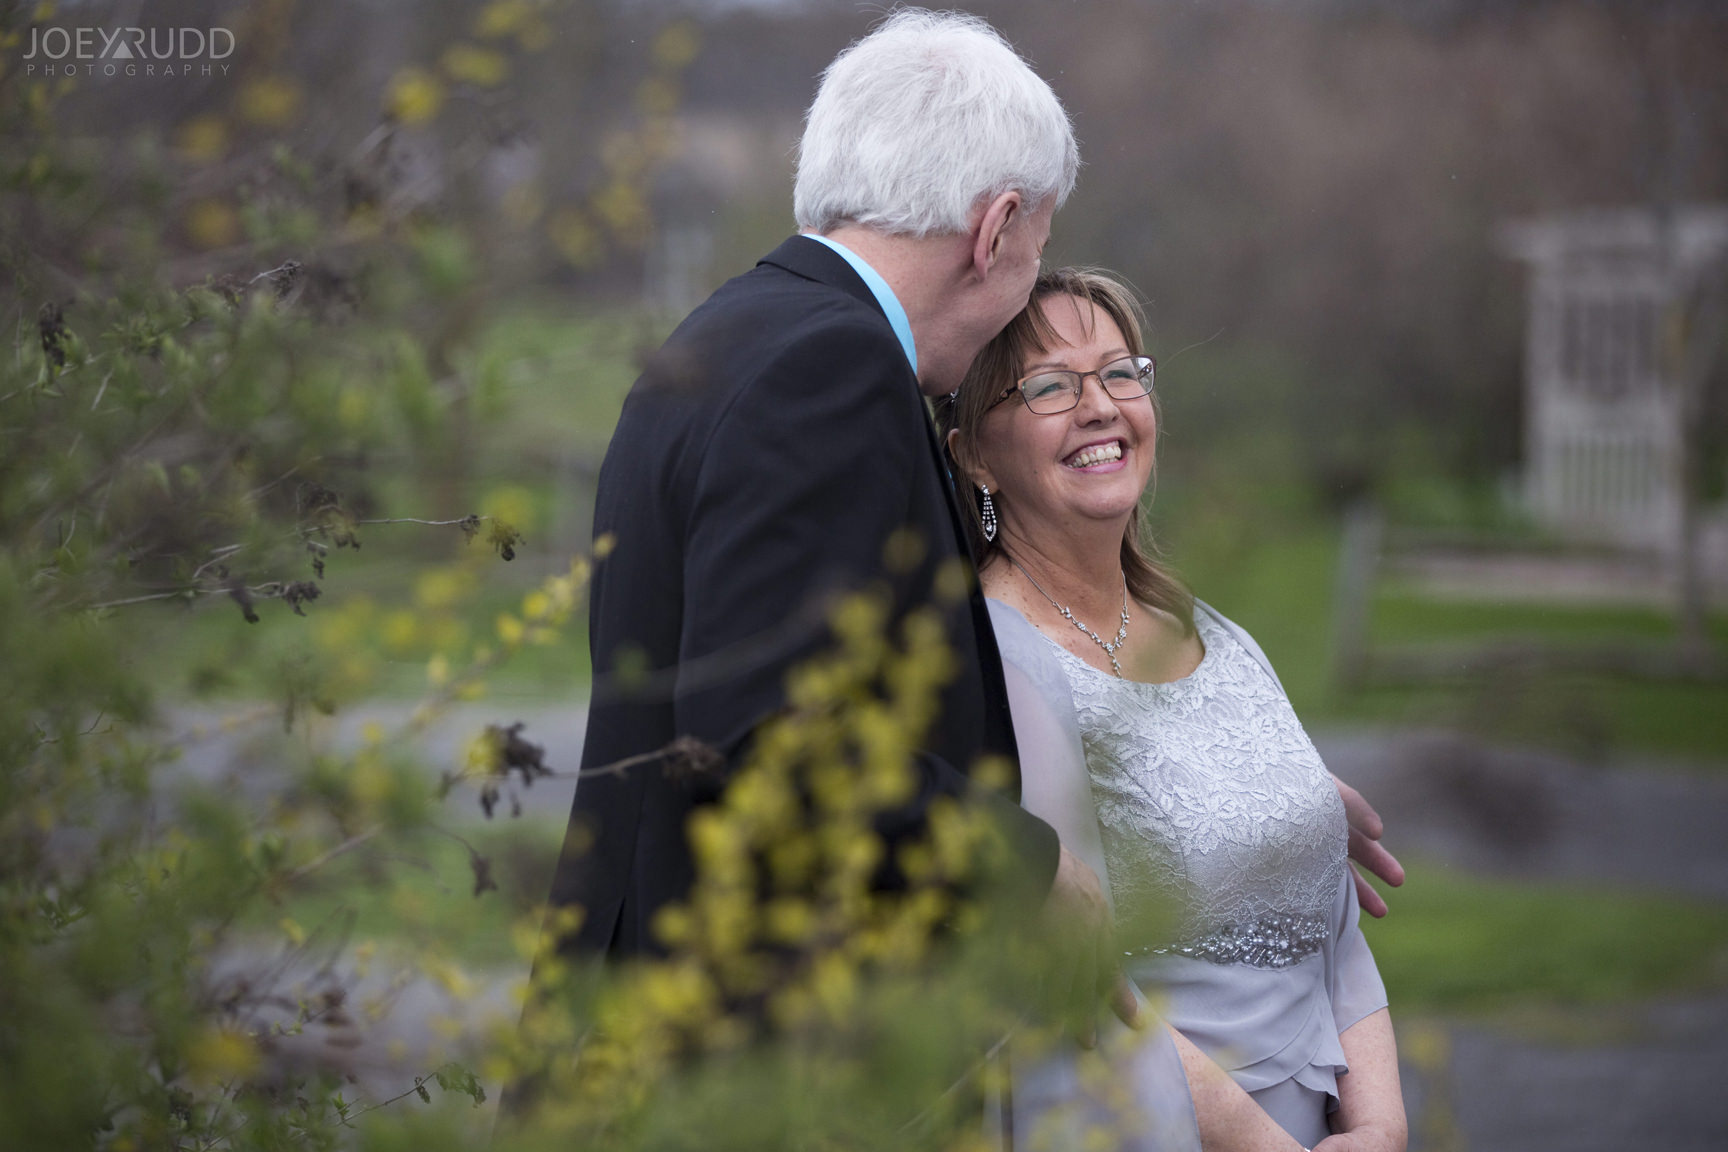 Strathmere Wedding by Ottawa Wedding Photographer Joey Rudd Photography Spring Garden House Inn